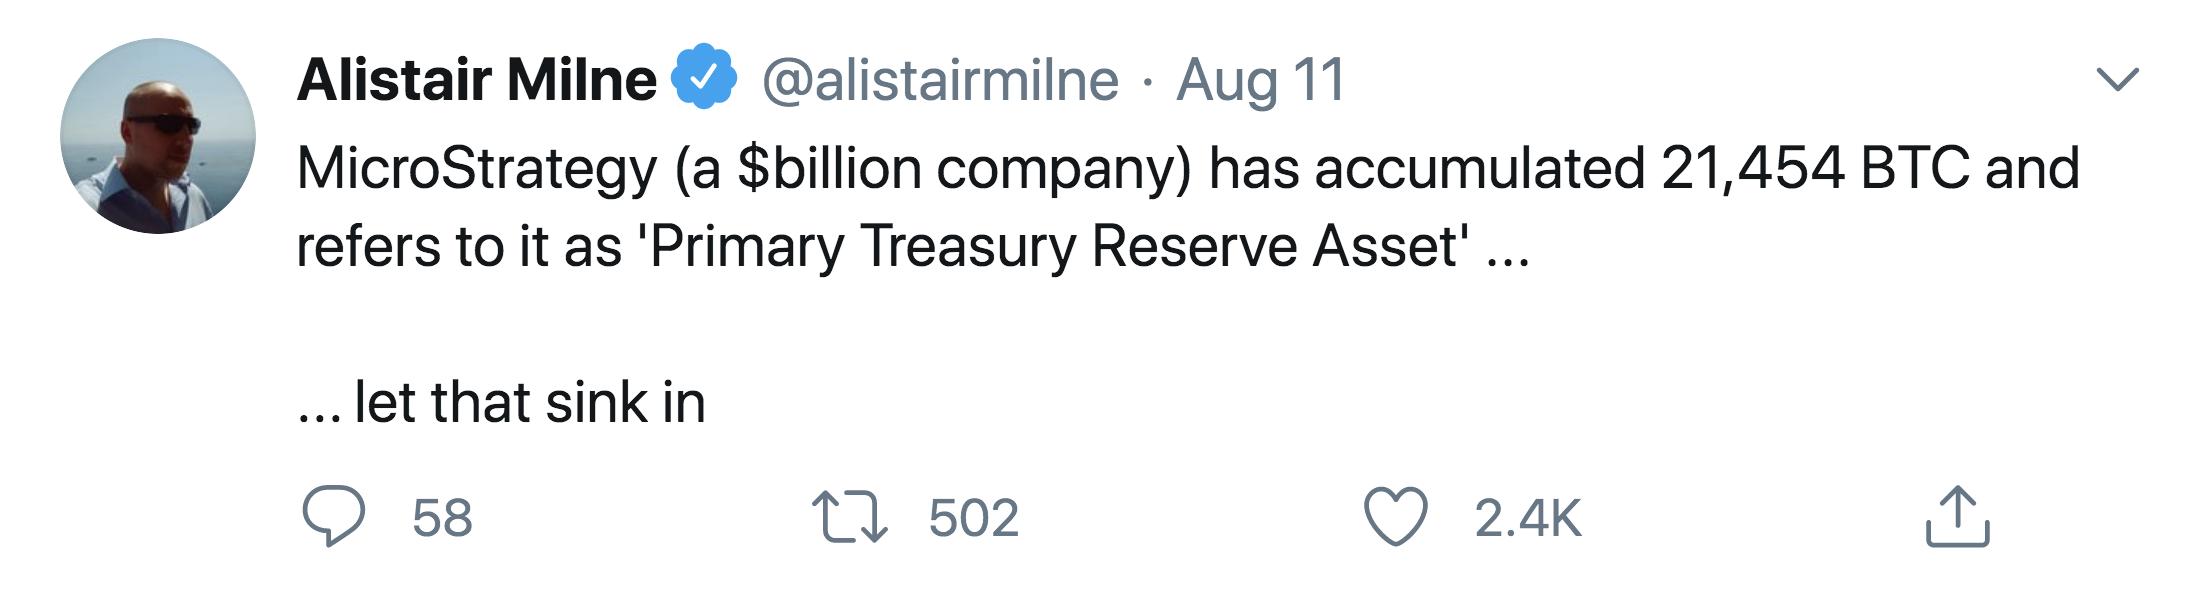 Alistair Milne Microstrategy Bitcoin